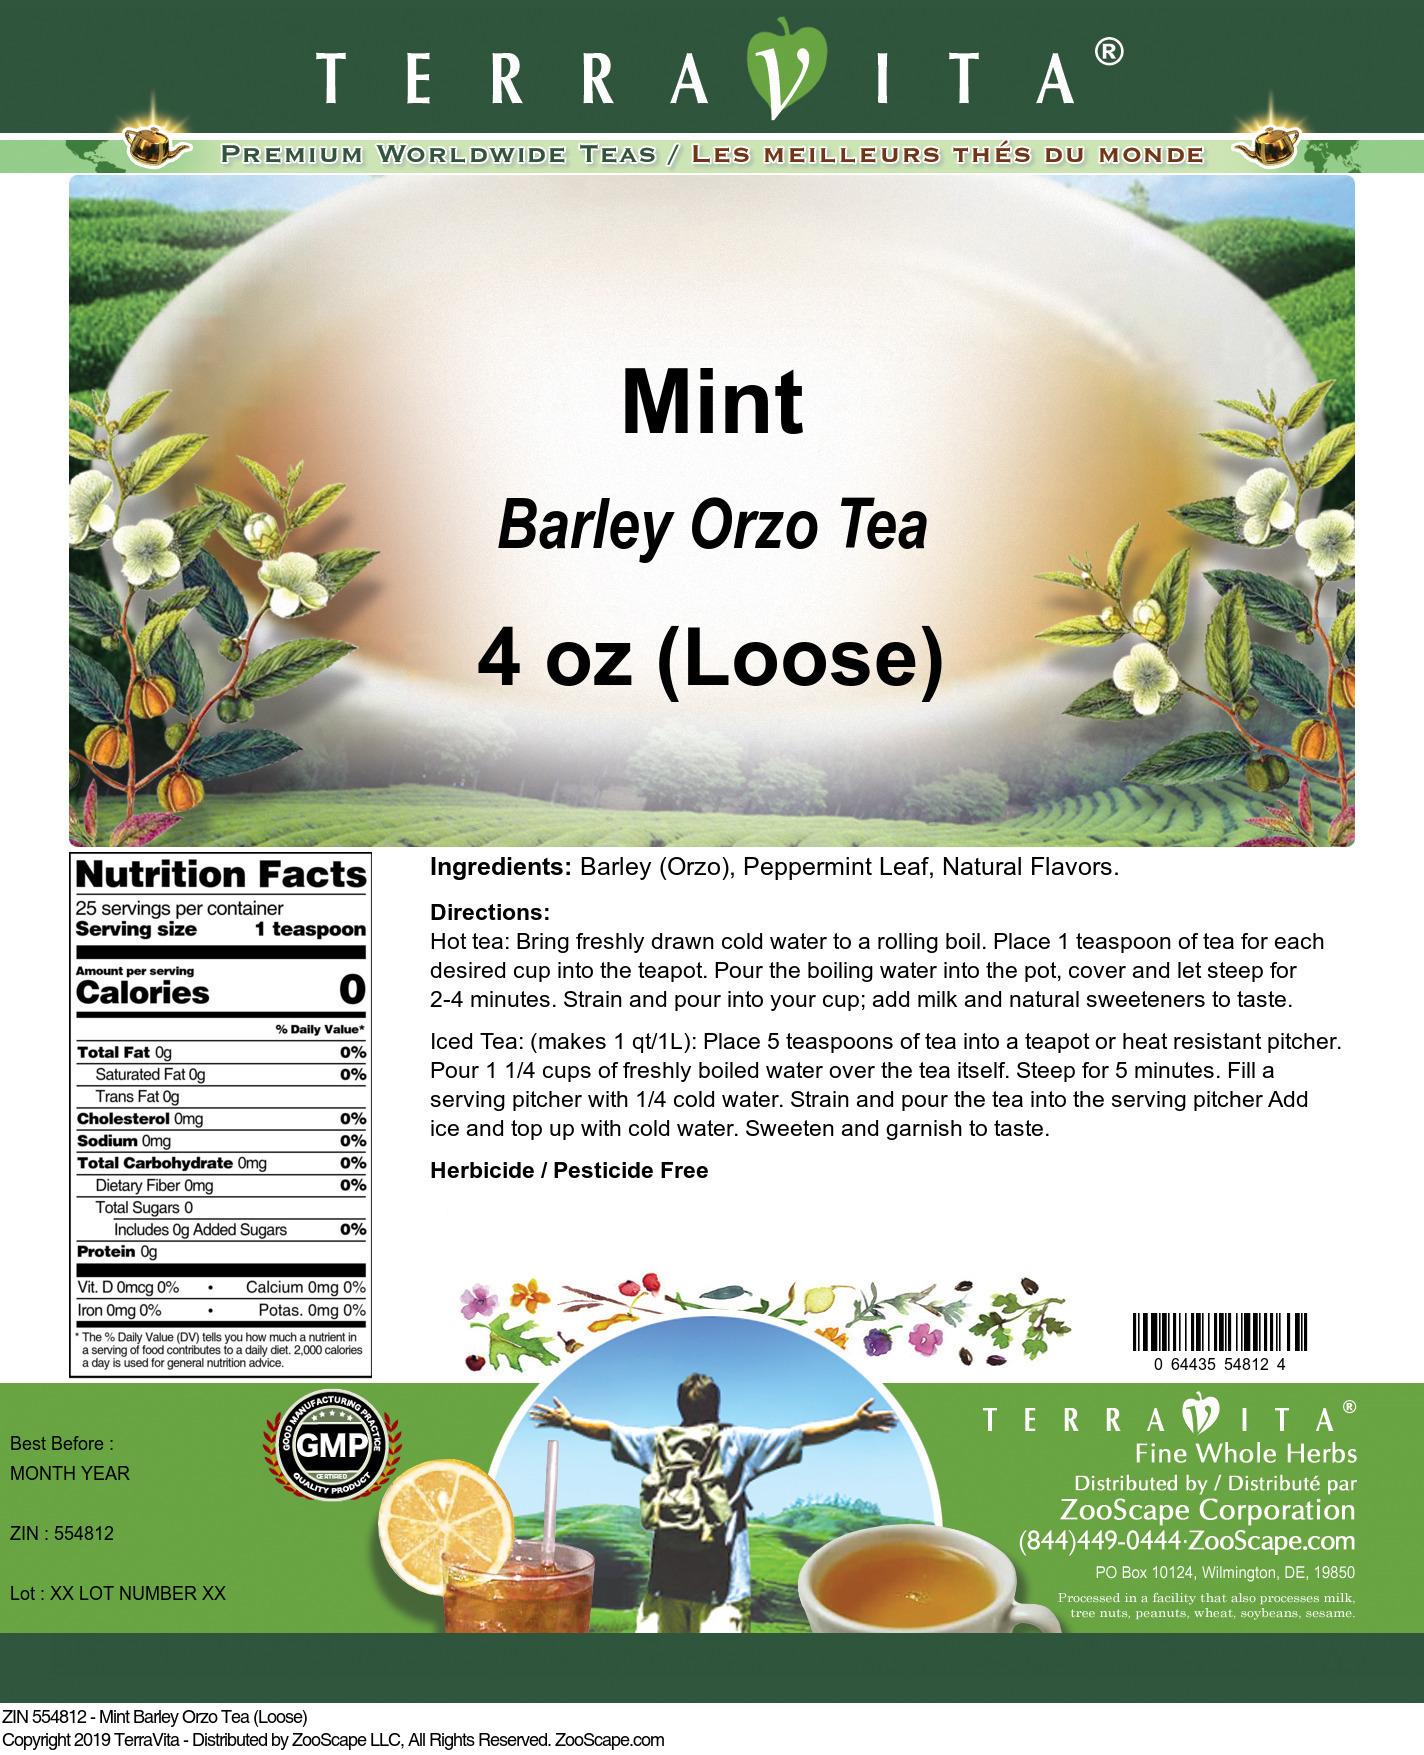 Mint Barley Orzo